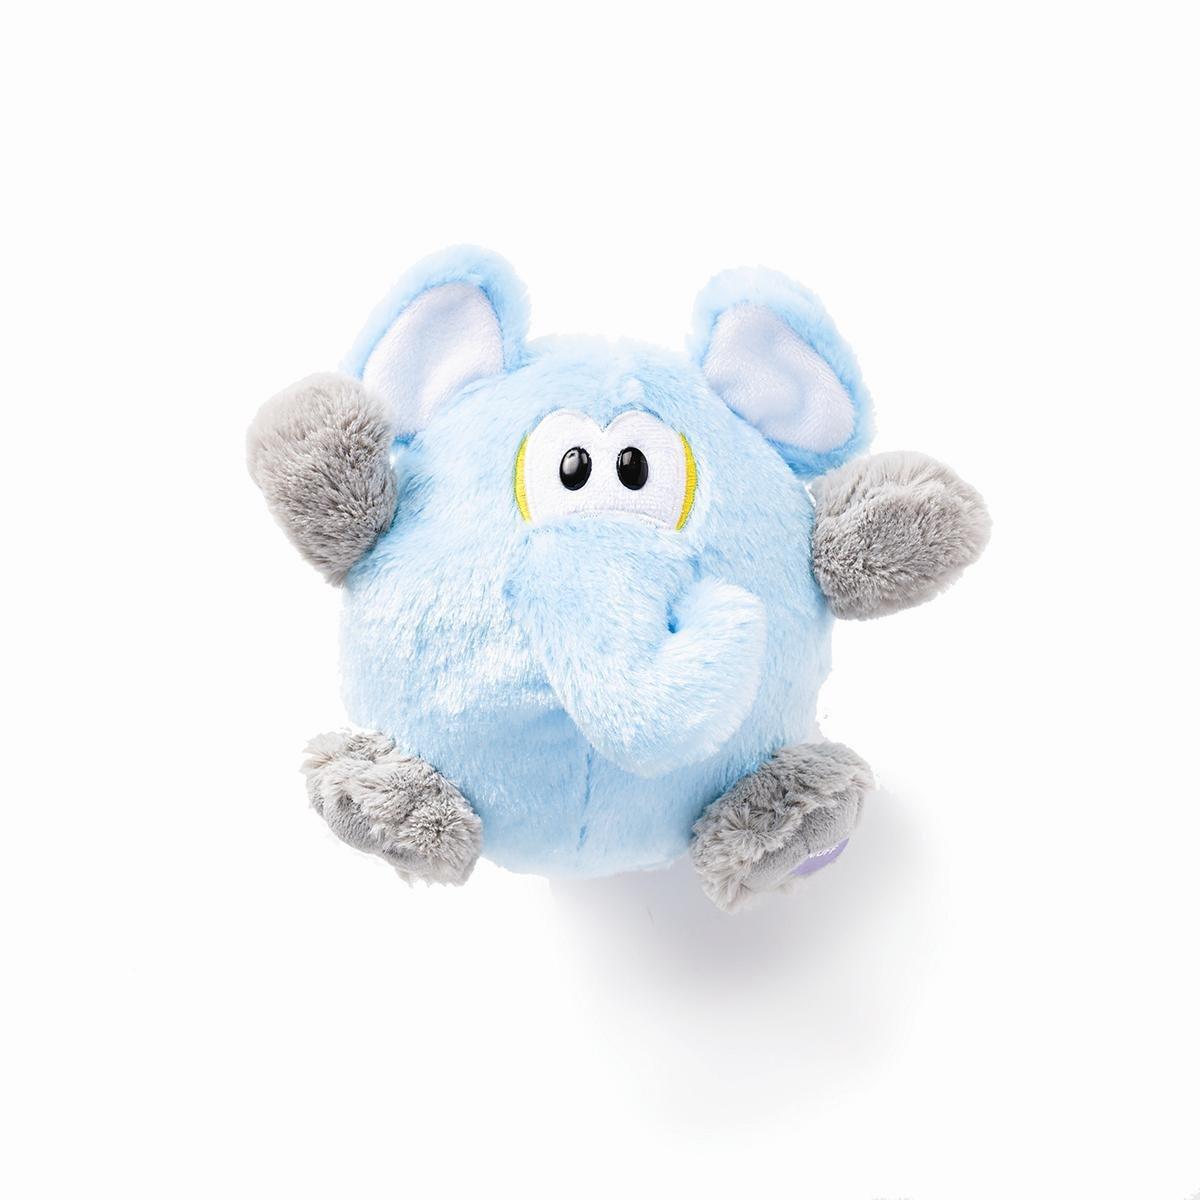 DEMDACO Plush Toy, Giggaloos Elephant